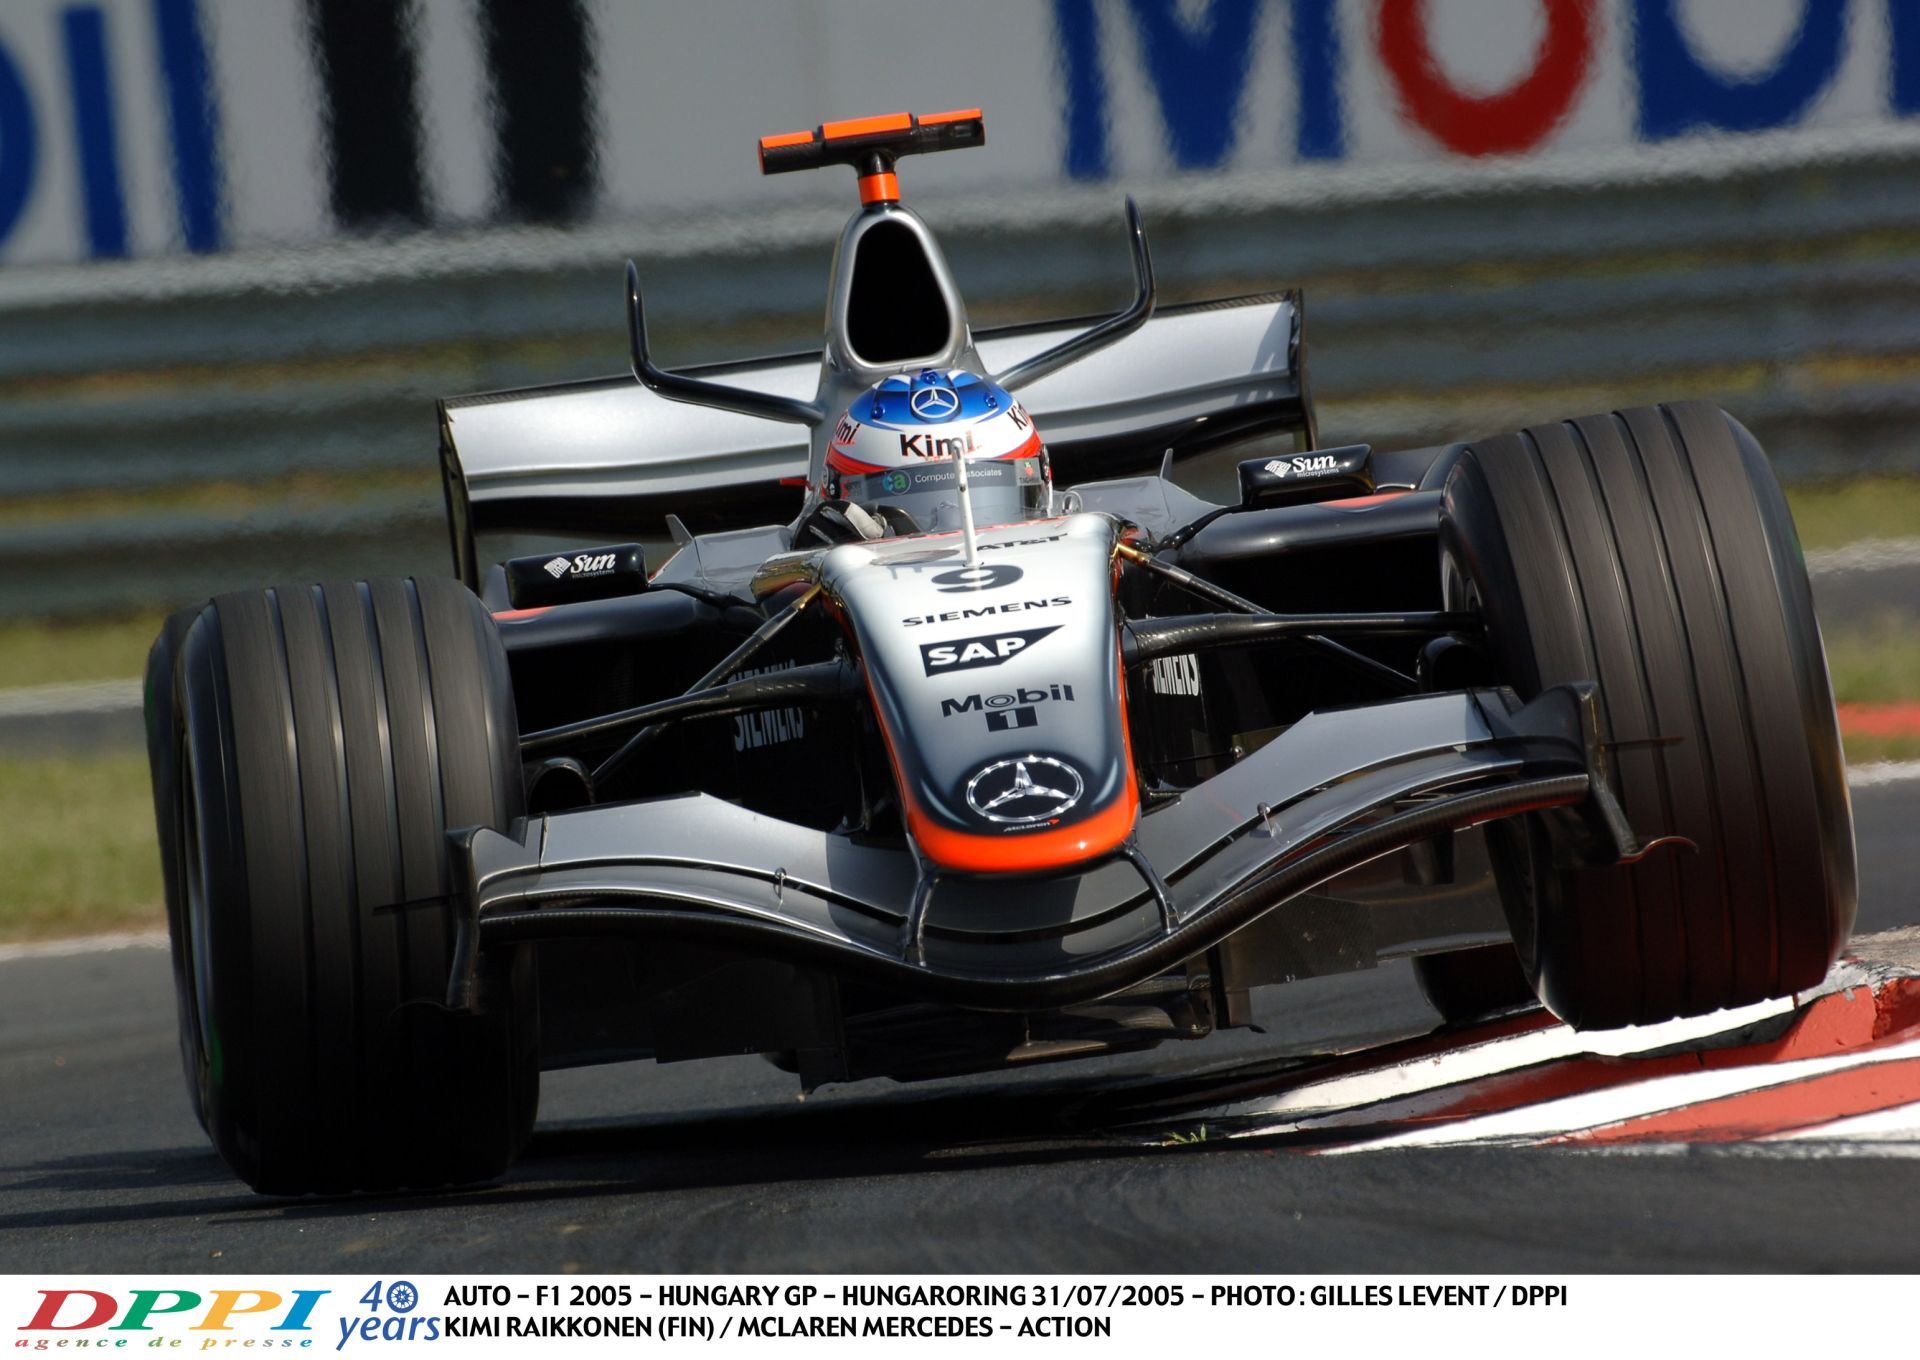 Räikkönen a Hungaroringen 2005-ben a McLarennel: Brutális sebesség, csodálatos hangok